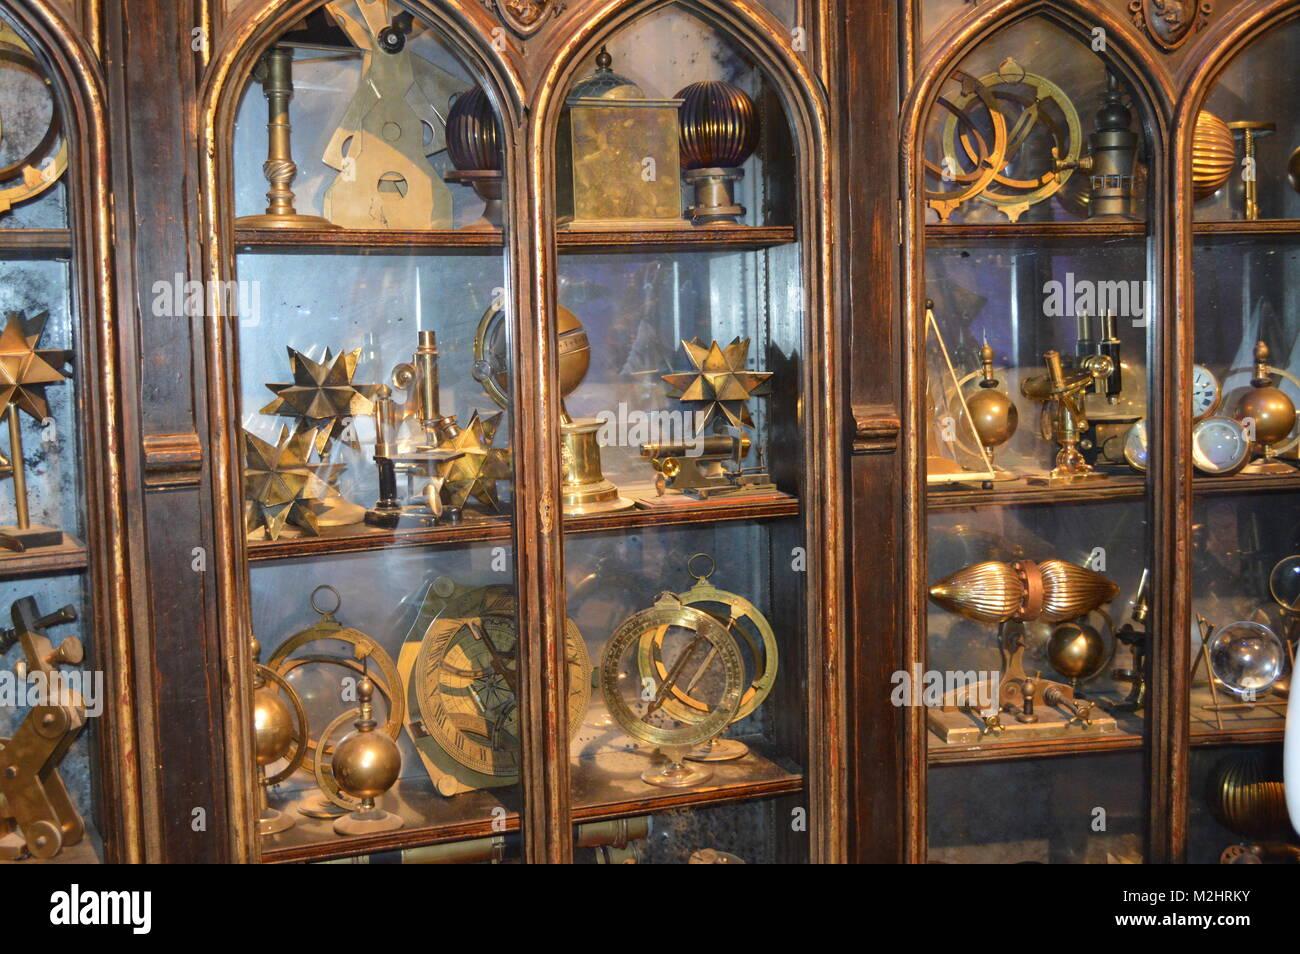 cabinet of curiosities - Stock Image